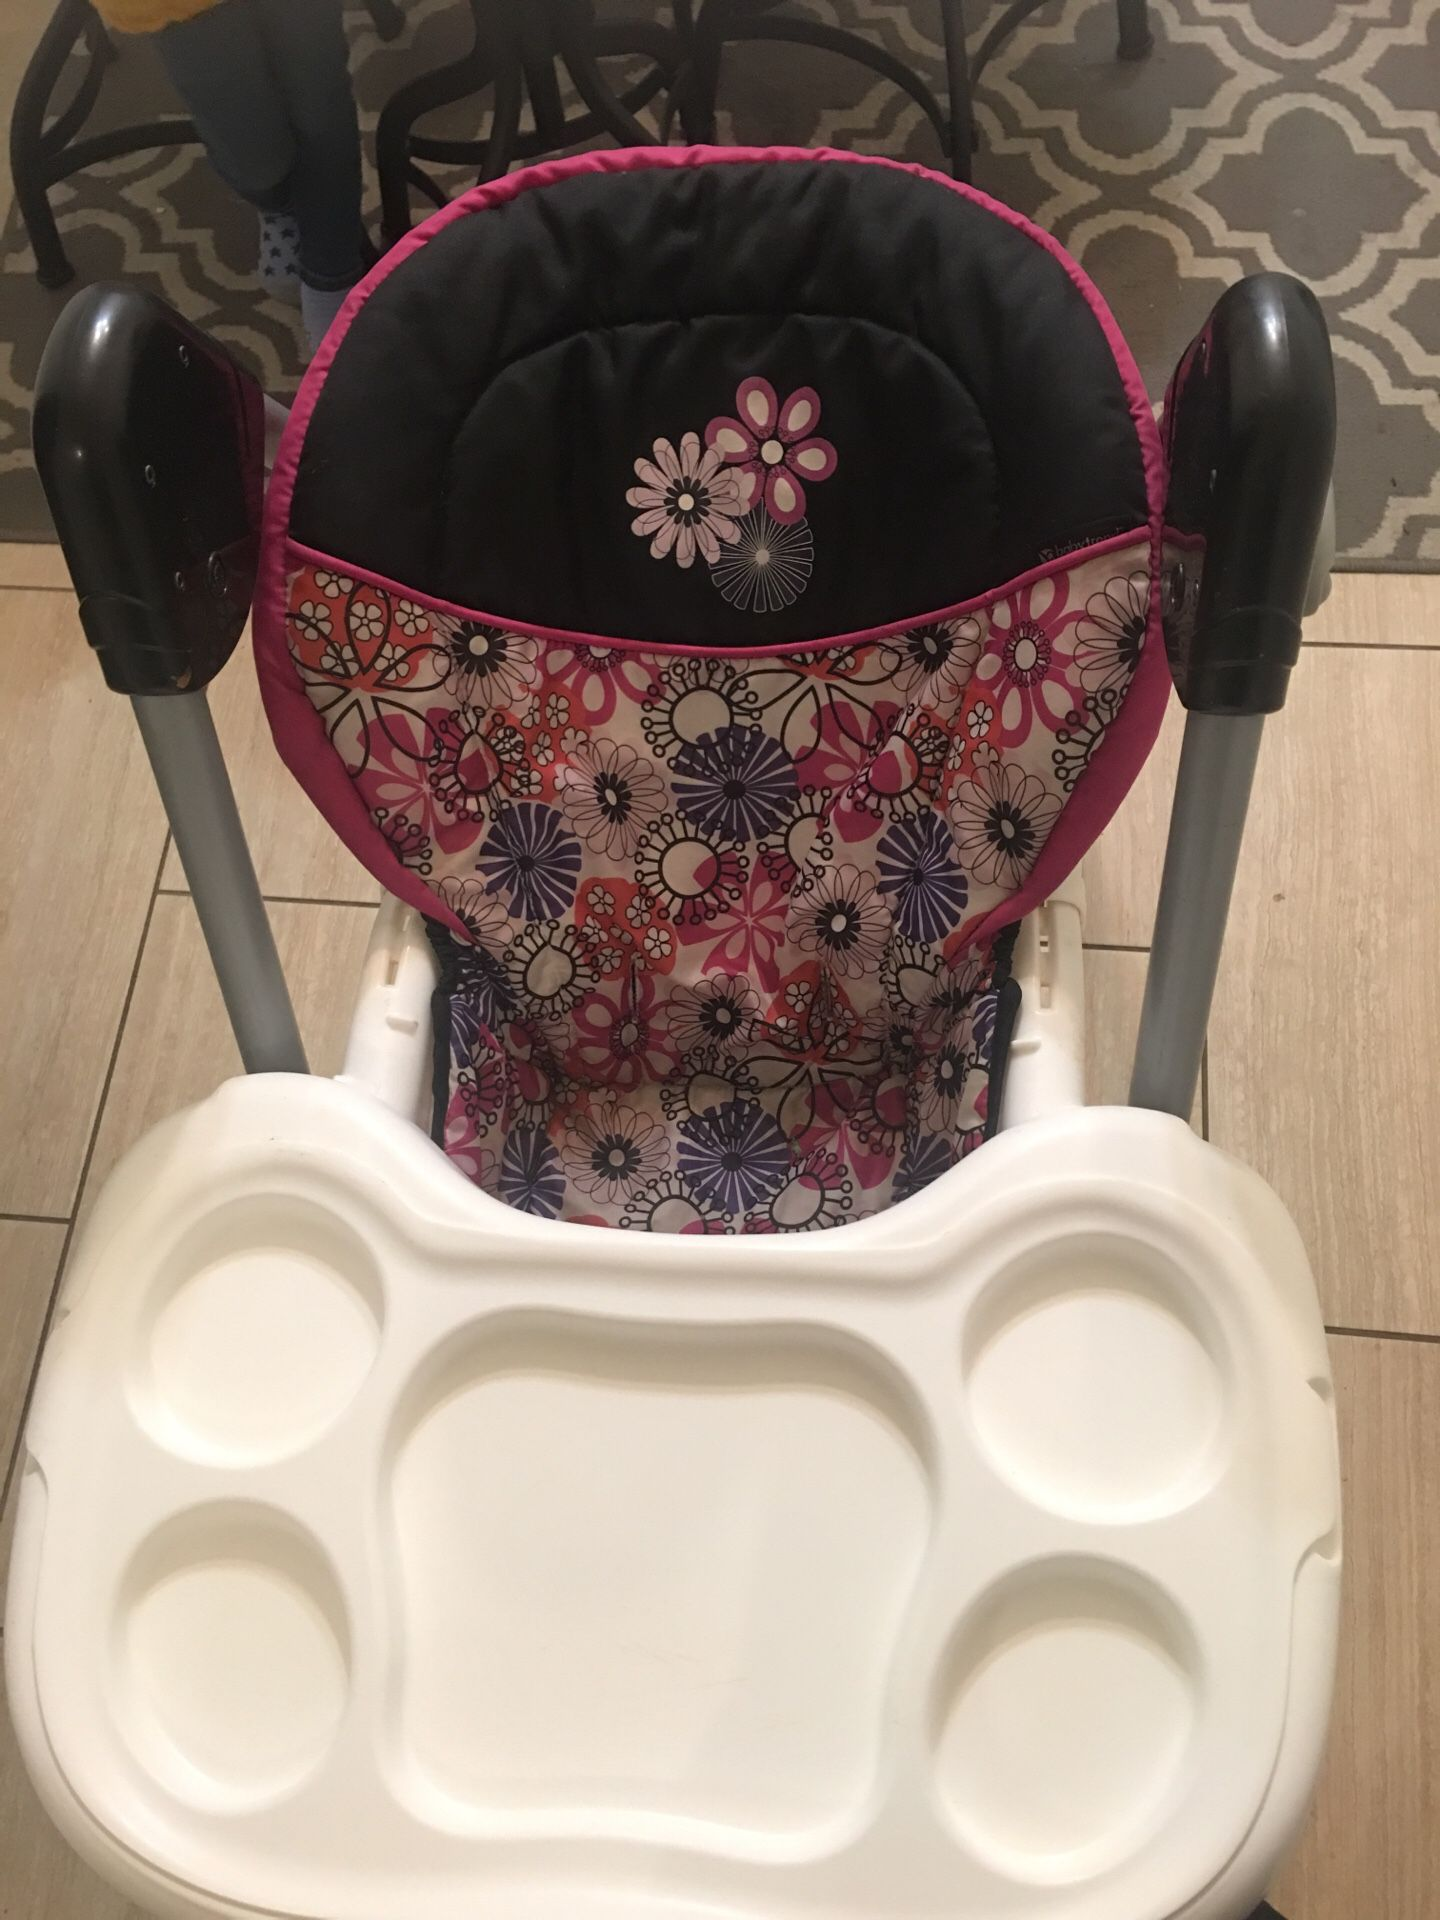 Adjustable High chair